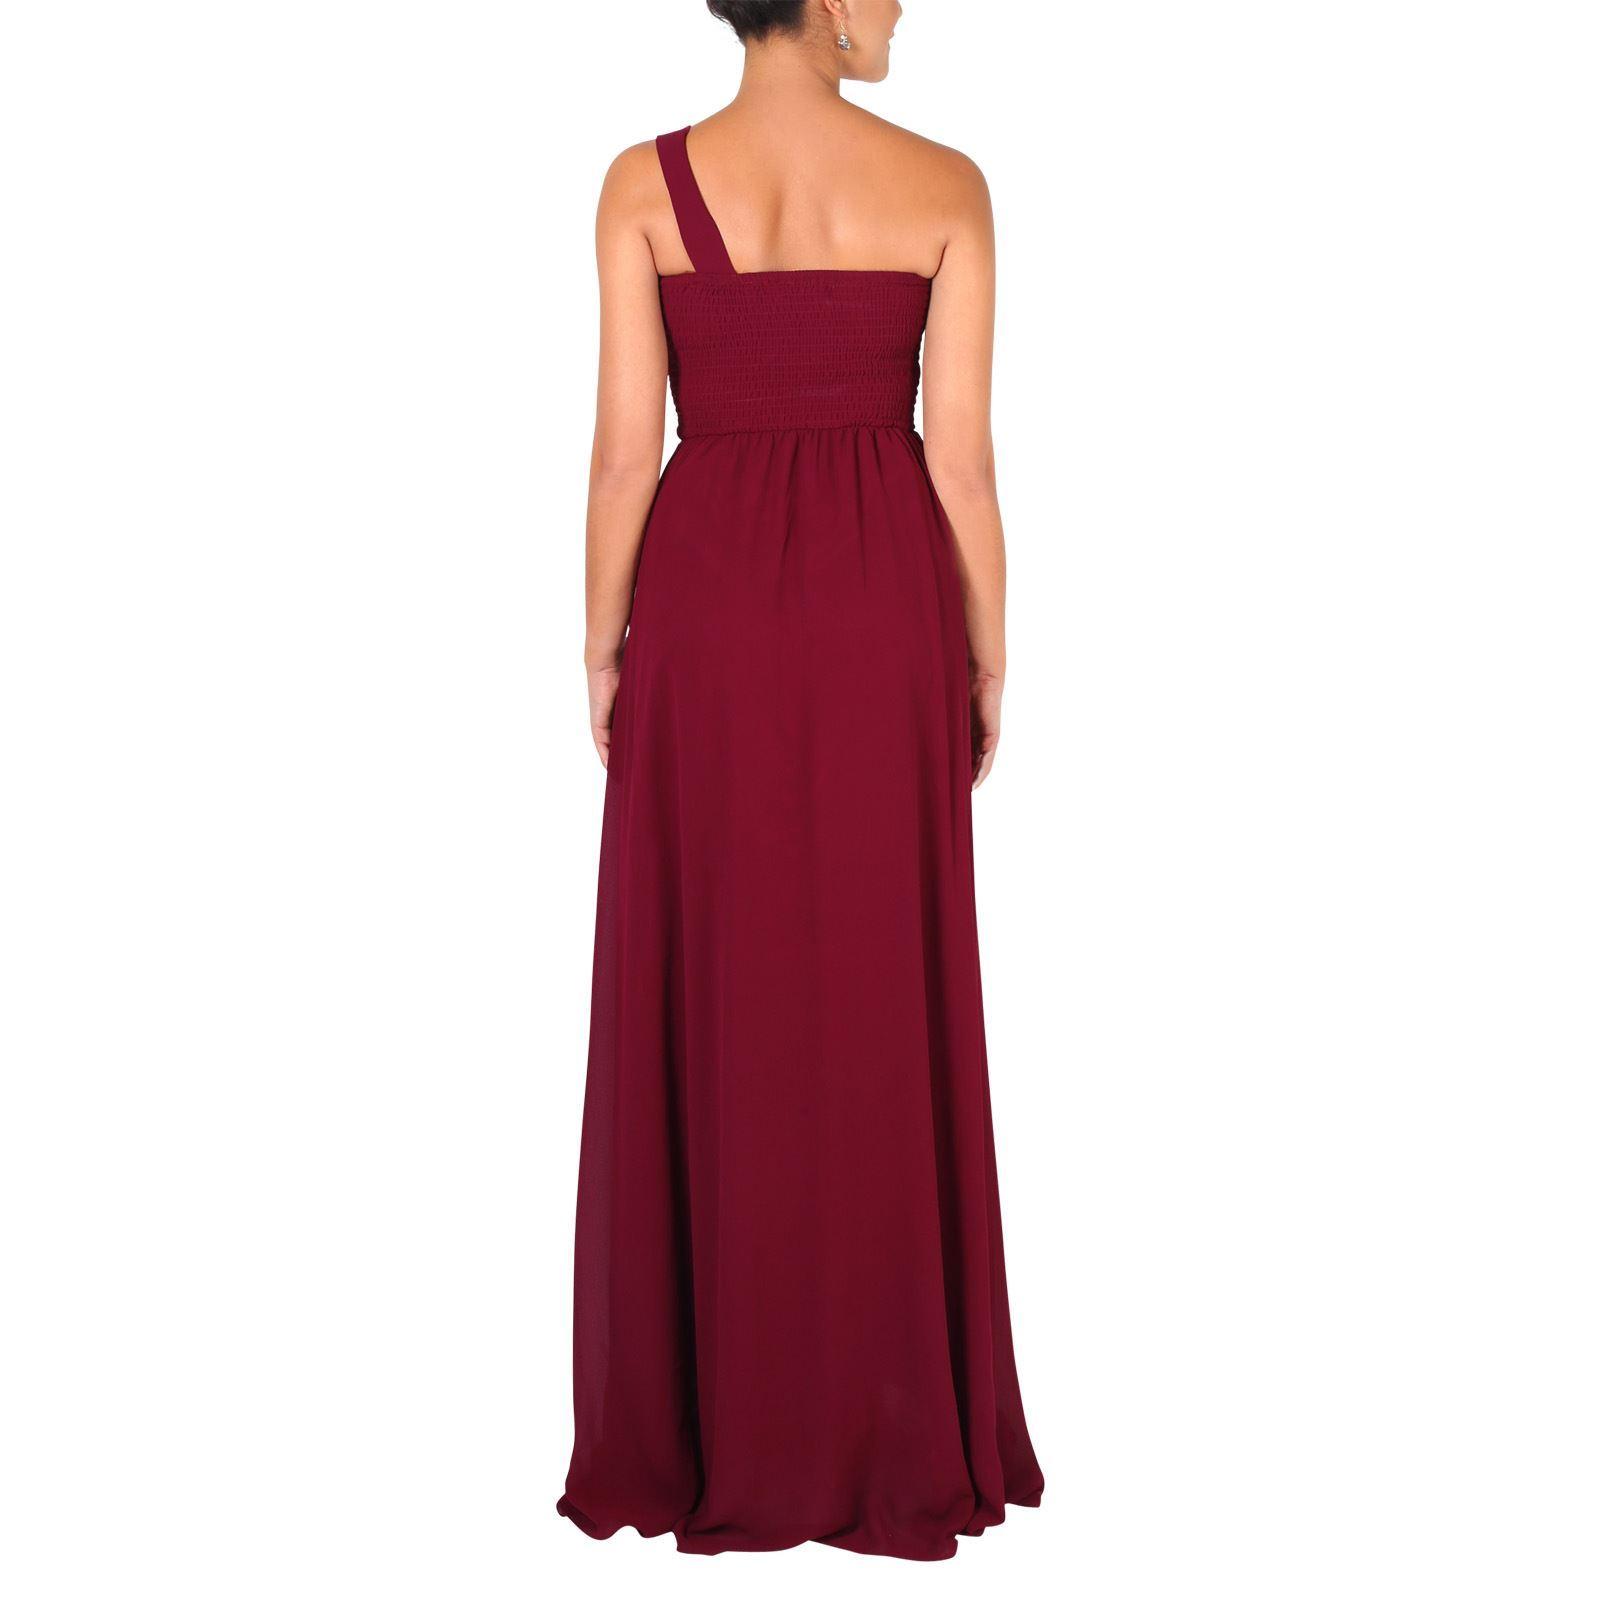 Womens-Wedding-Bridesmaid-Prom-Dress-Formal-One-Off-Shoulder-Long-Evening-8-18 thumbnail 82